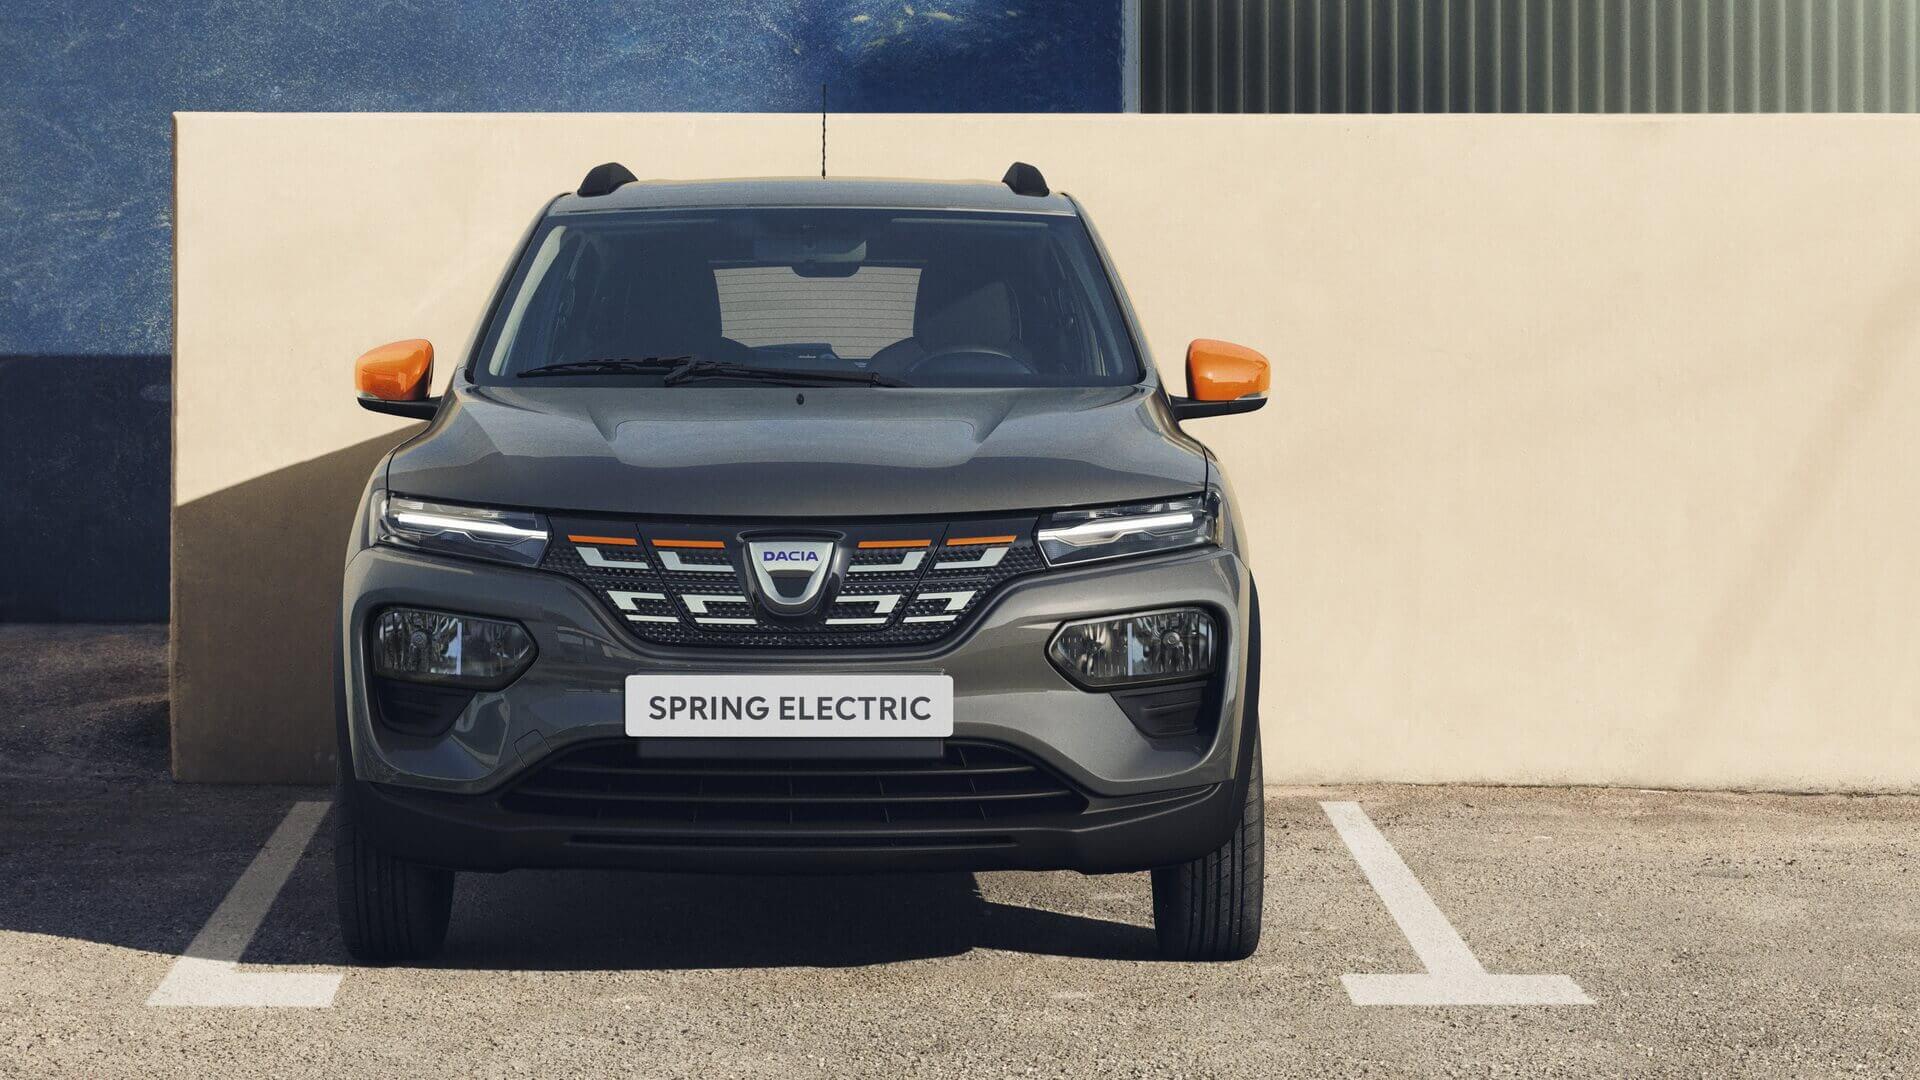 Передняя часть Dacia Spring Electric